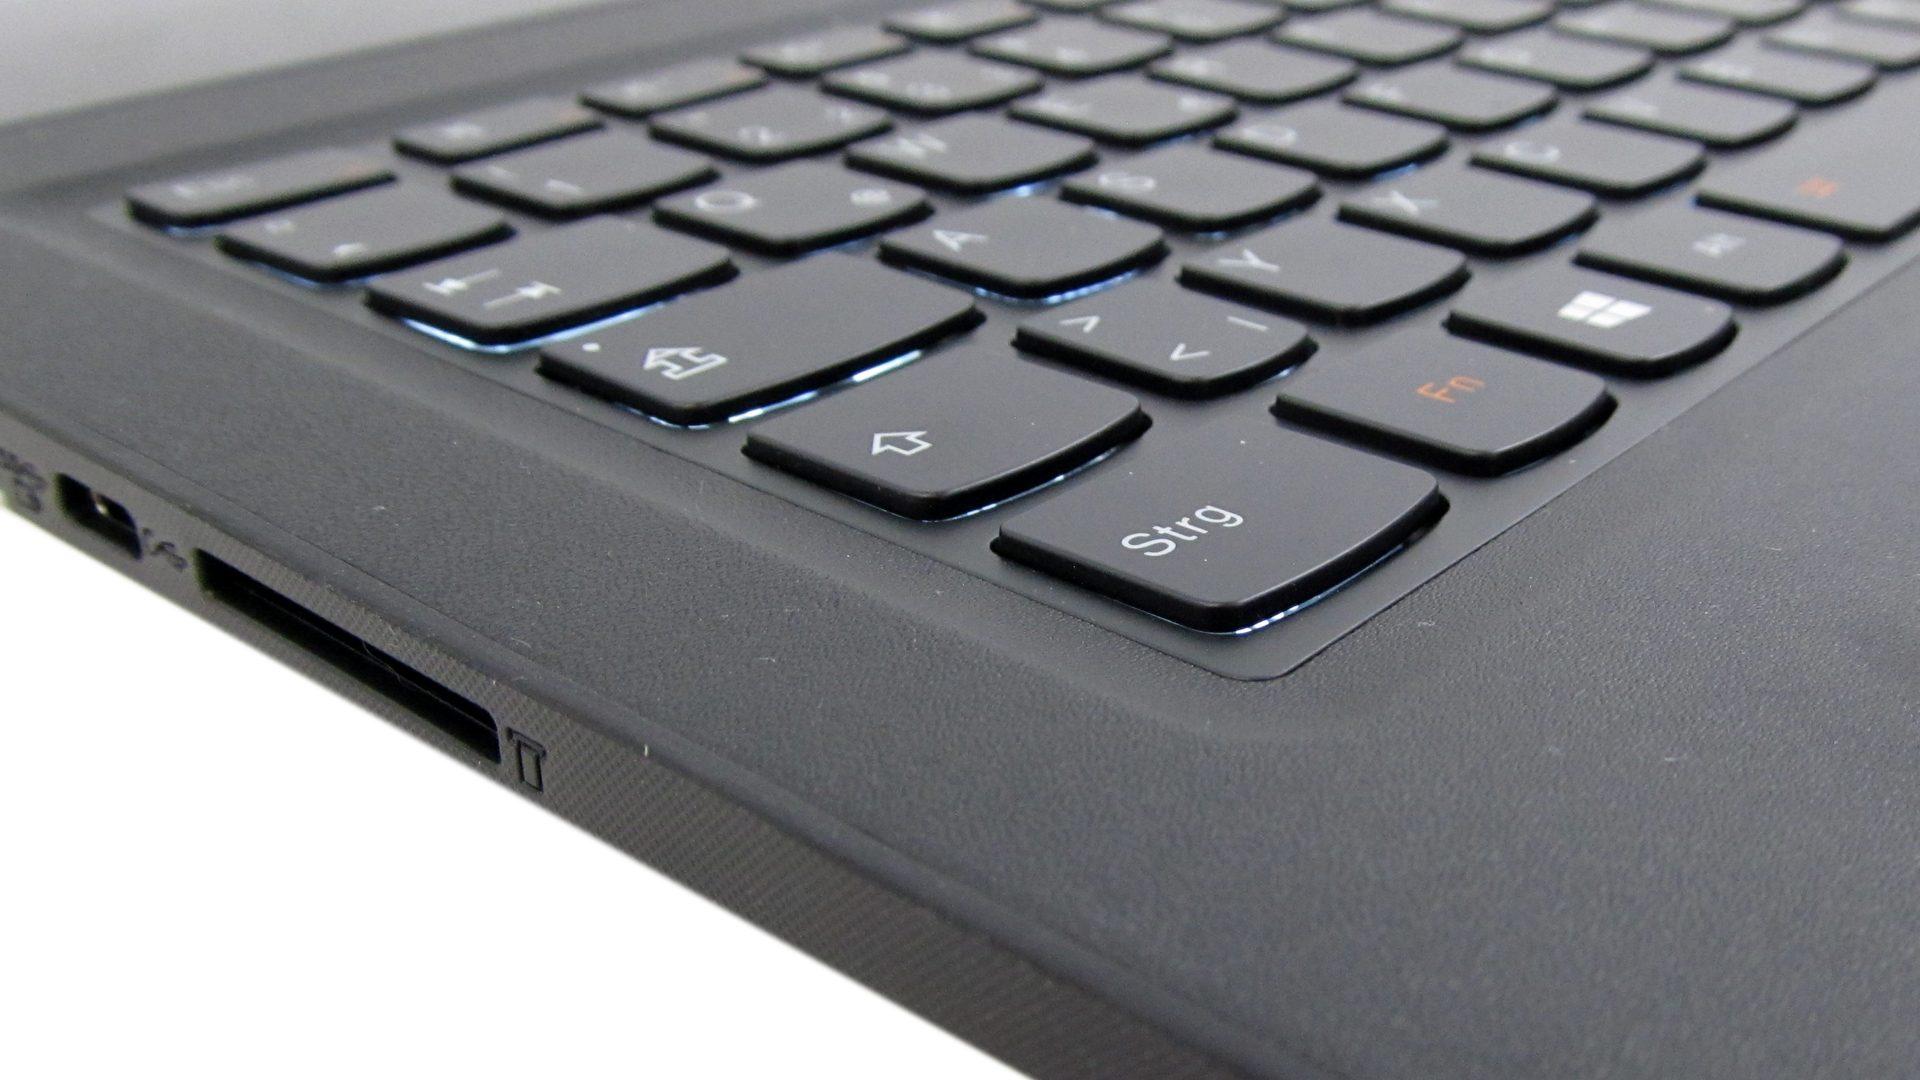 lenovo_yoga_900_13_silver_tastatur_2